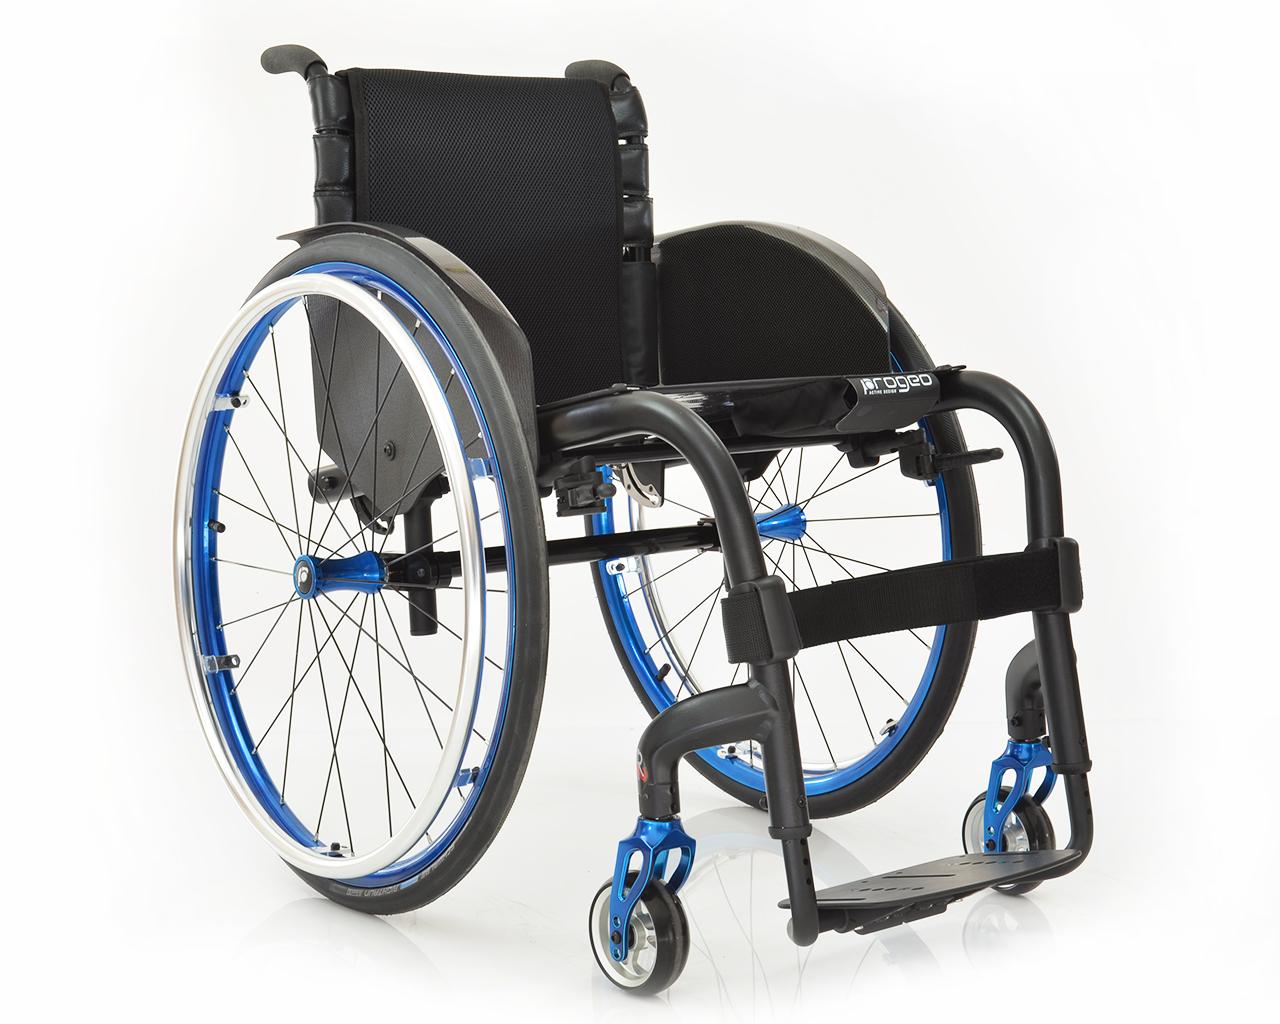 joker r2 active rigid wheelchair